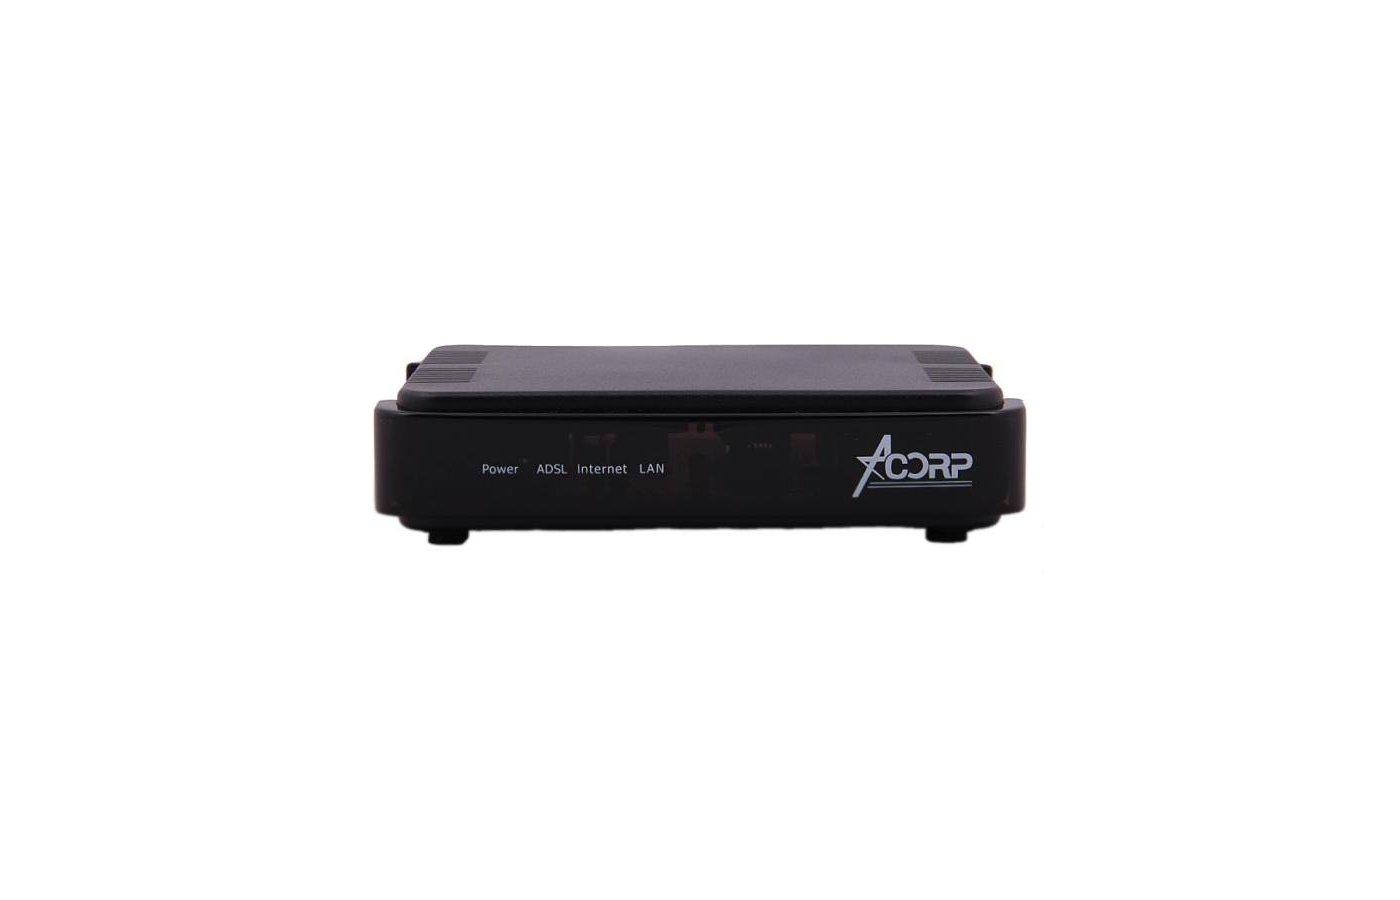 Модем Acorp Sprinter@ADSL LAN110